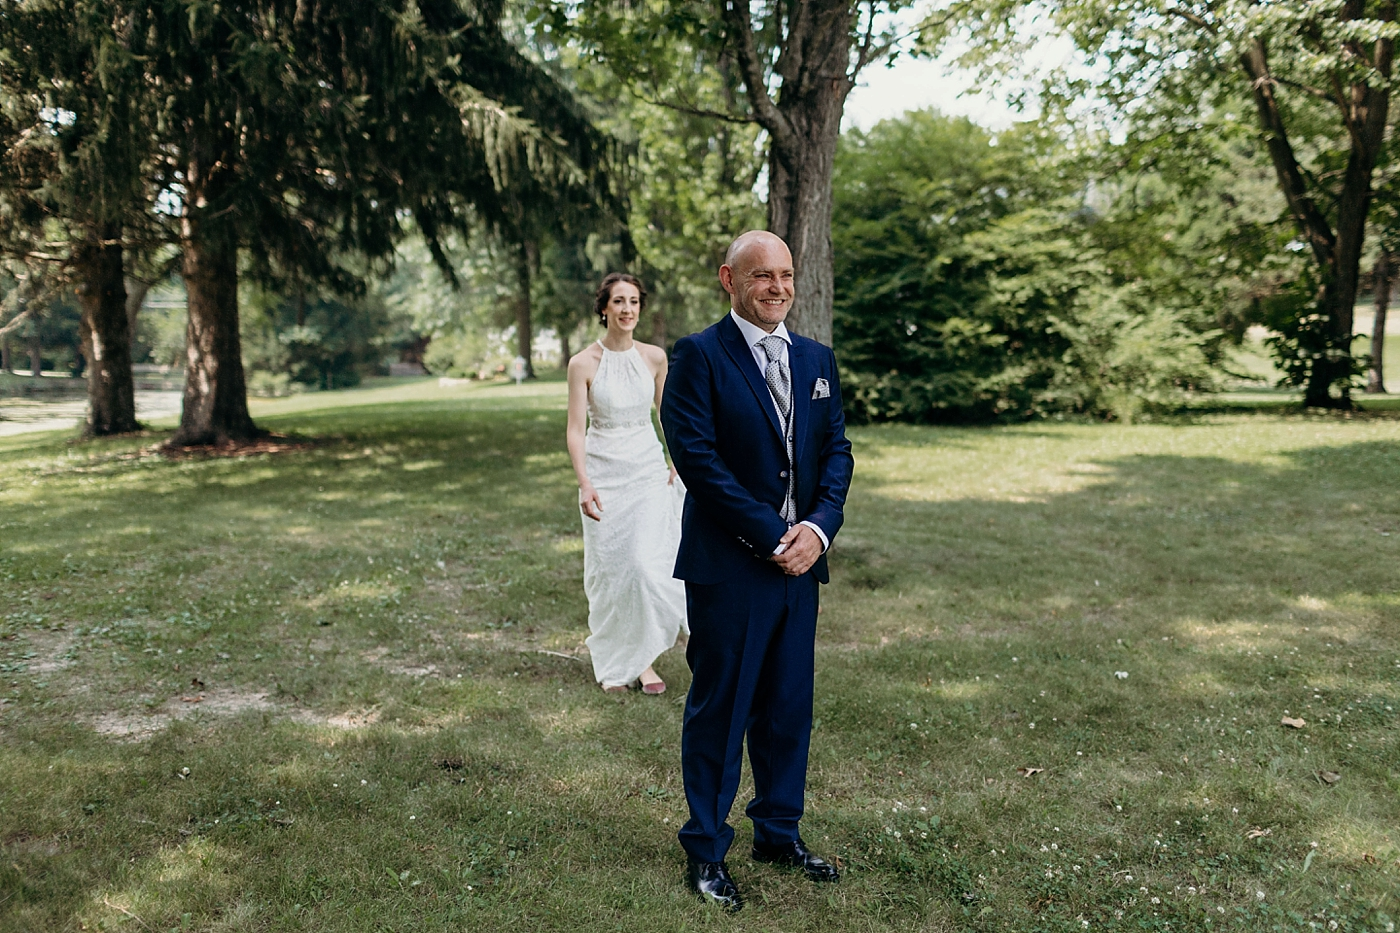 Chateau-Michelle-Wedding-Julia+JuanLuis_TheHeartlandersCo2018LP-18.jpg